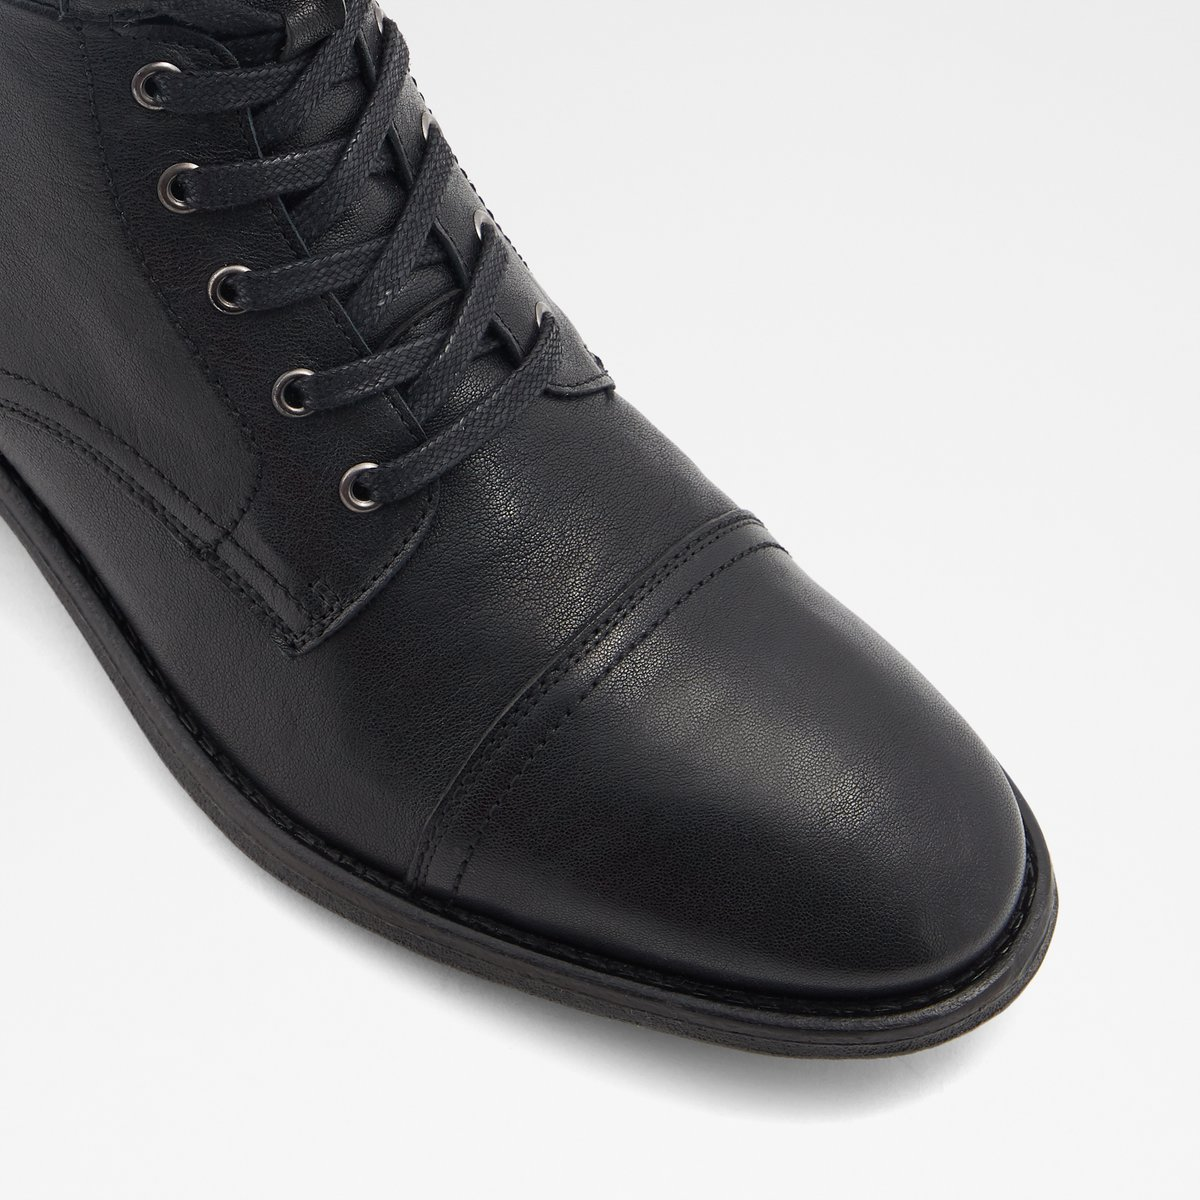 Adrein Black Men's Casual boots   ALDO US